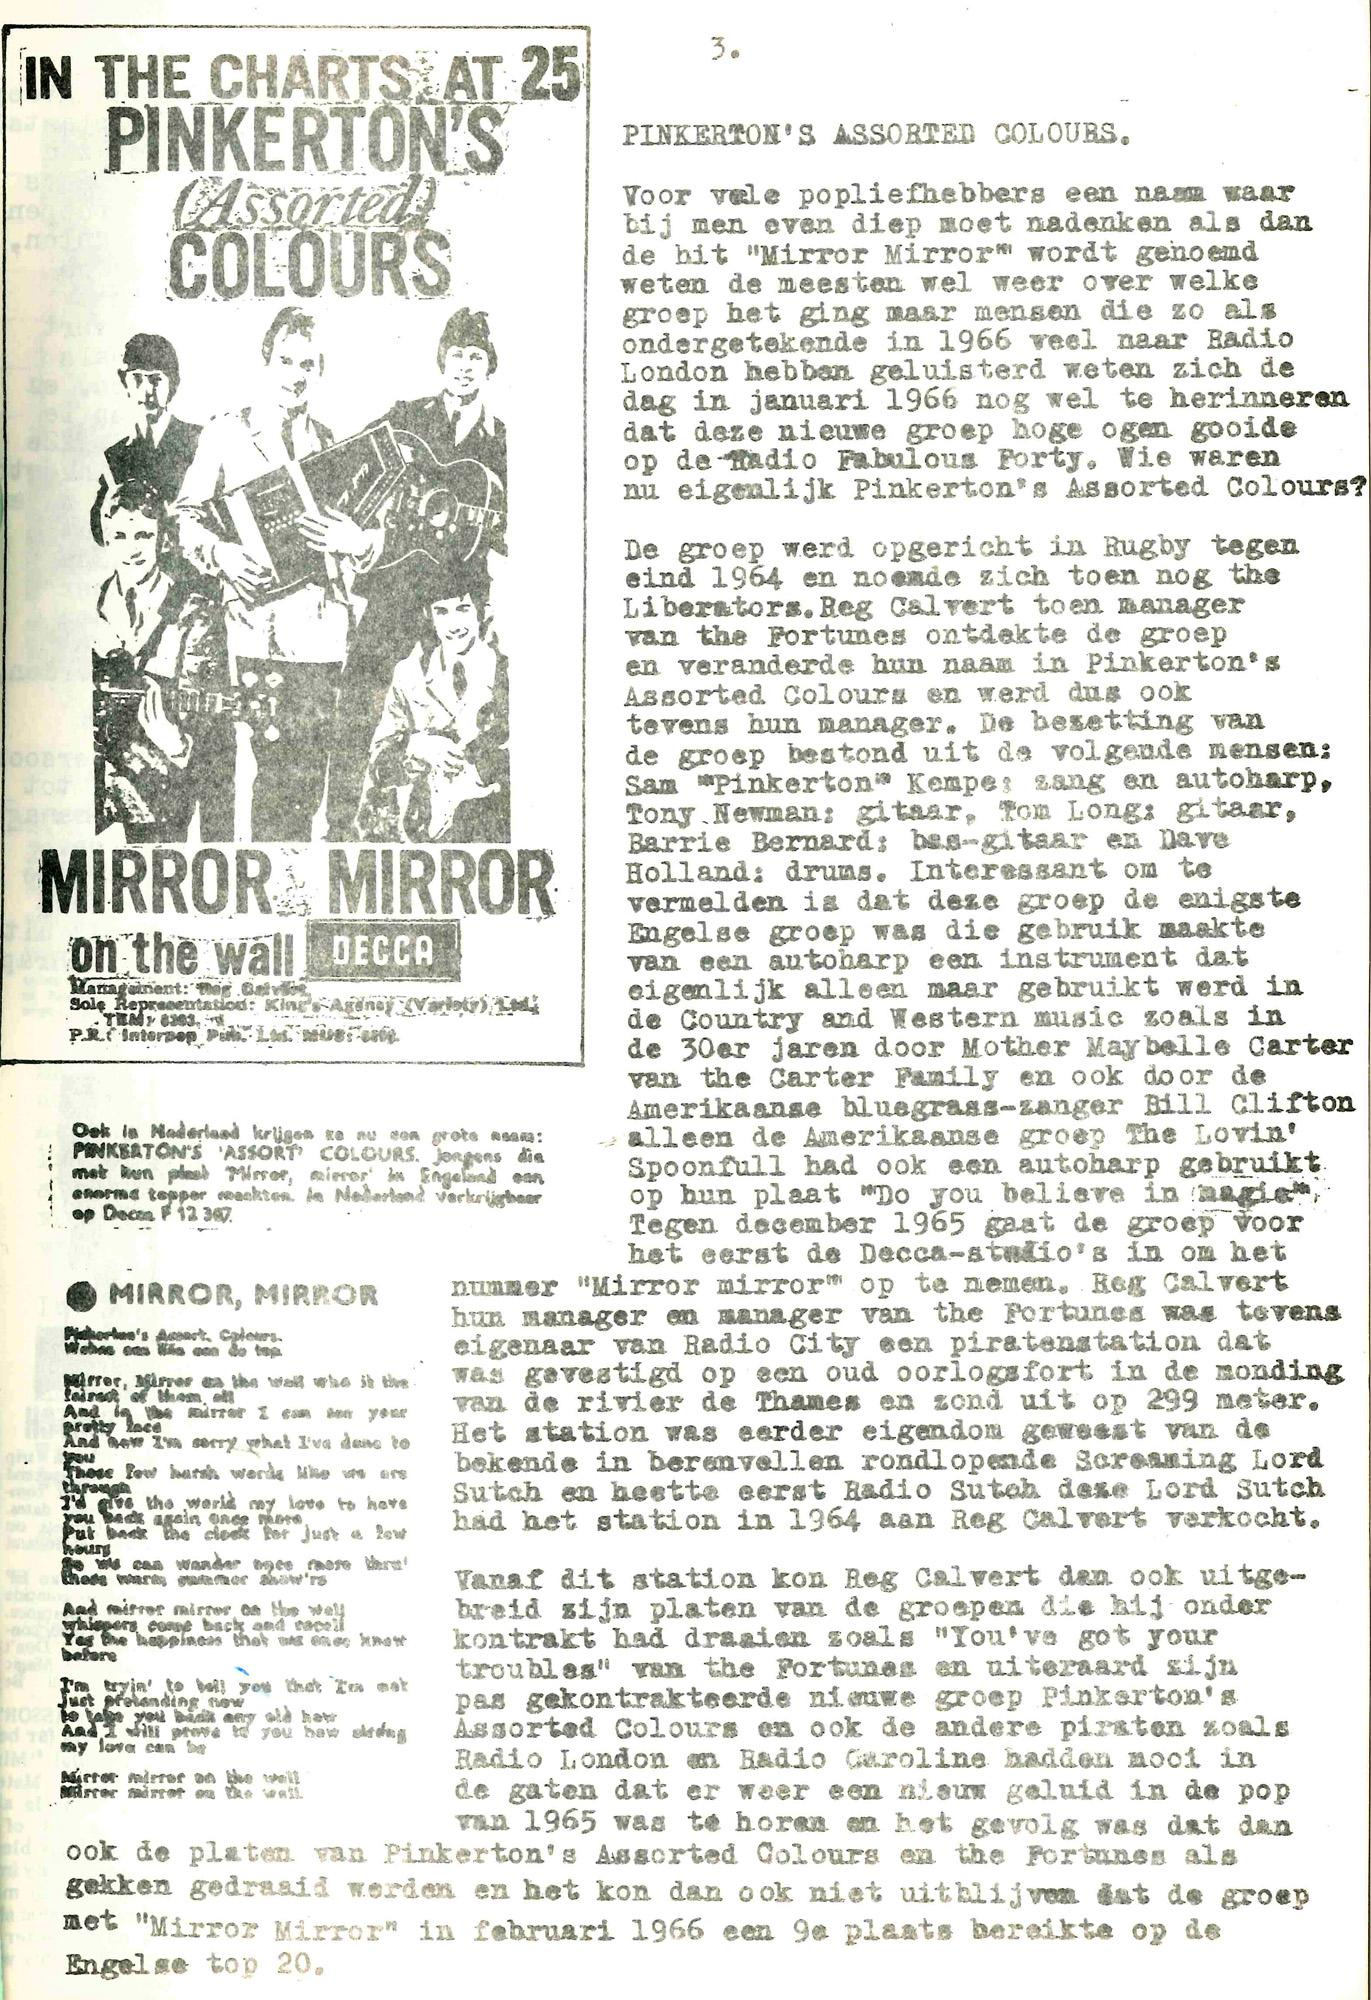 197602_TFSOTS_Radio_City01.jpg